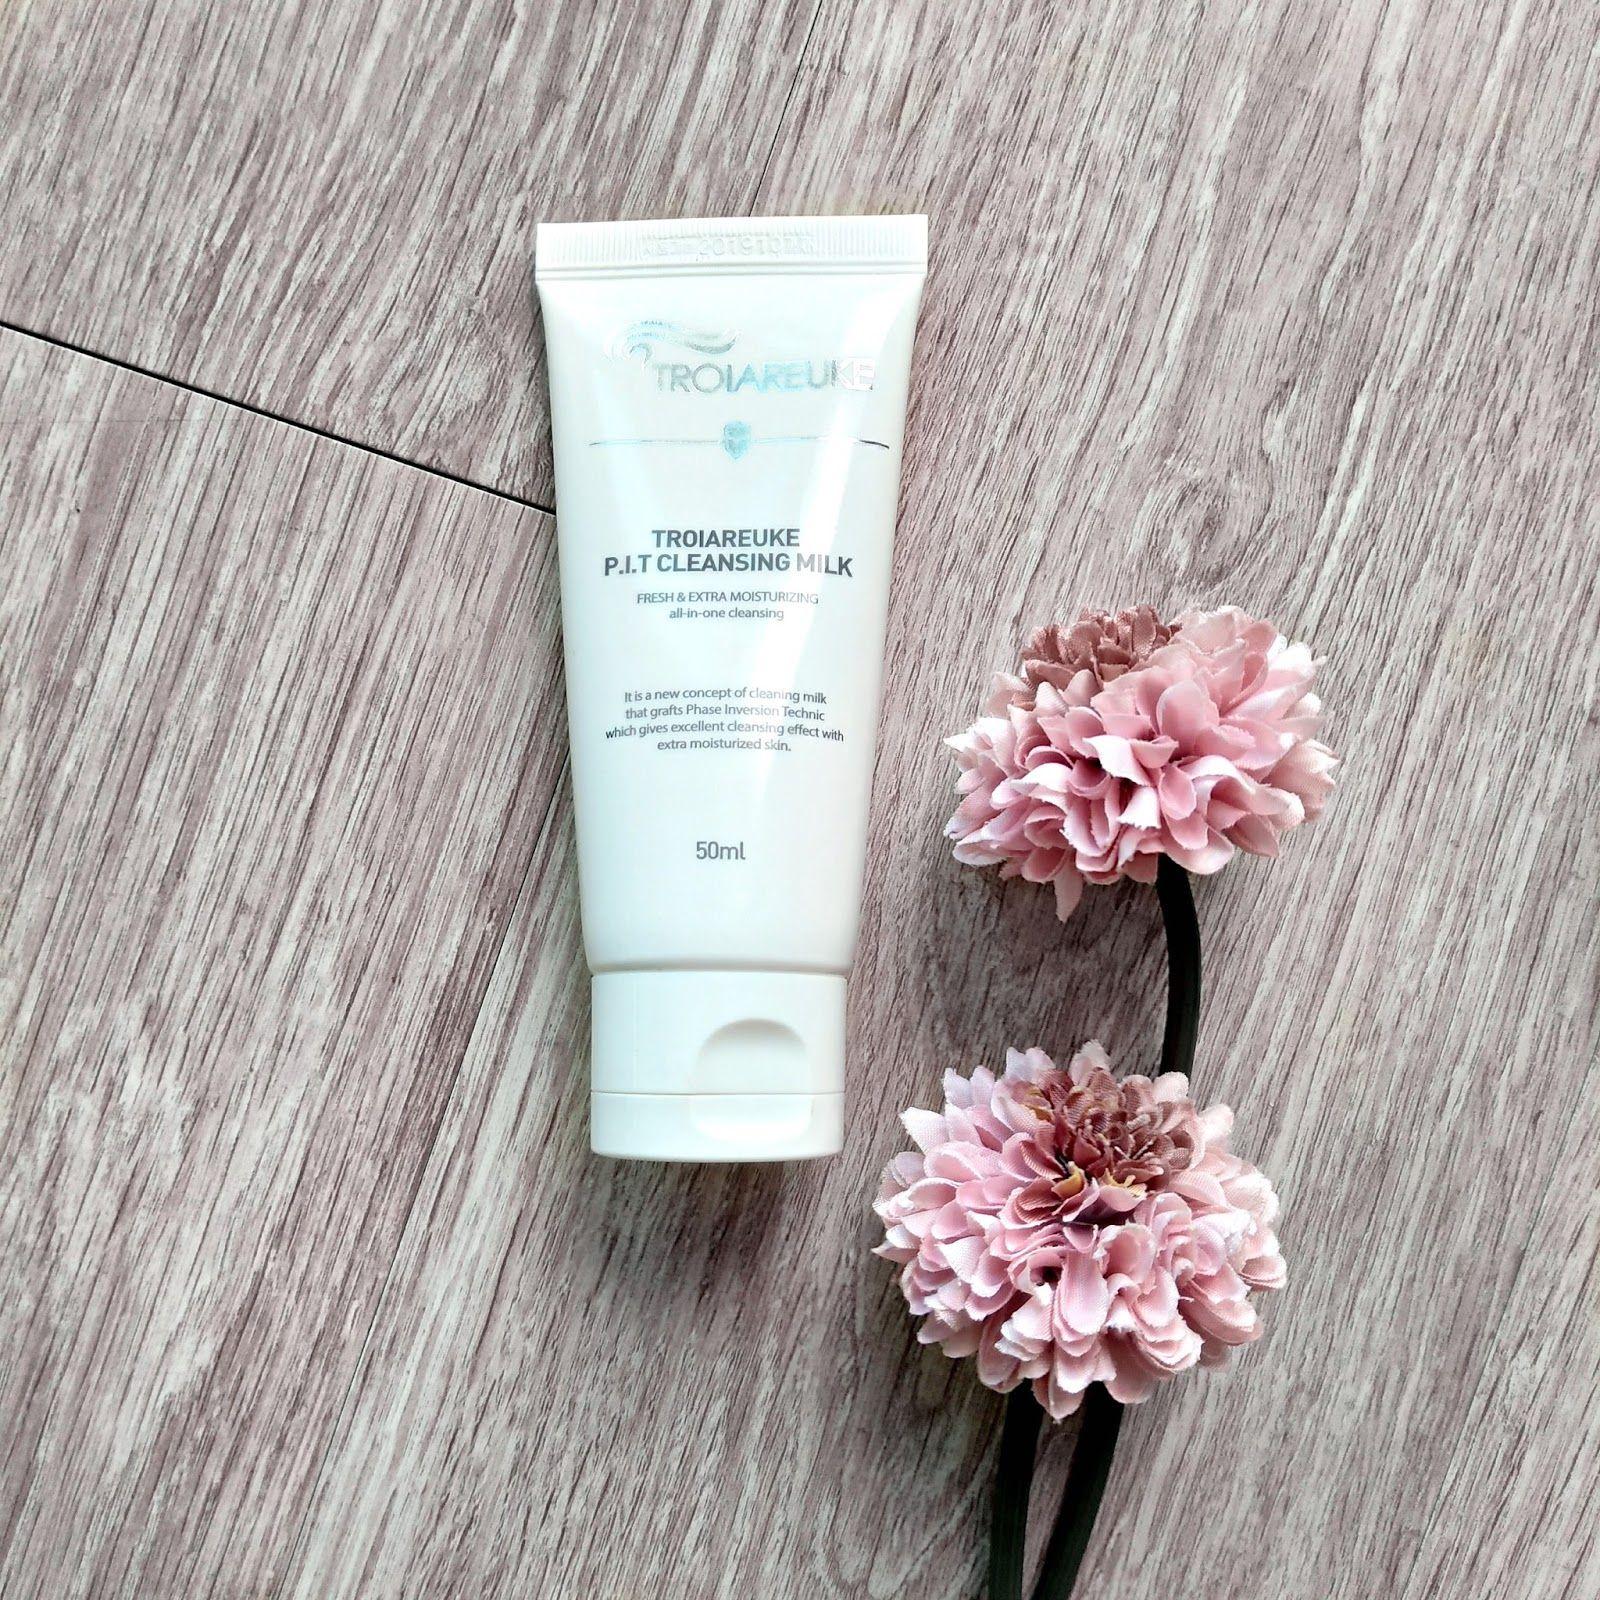 One Brand Focus⎮Top TROIAREUKE Skincare Travel beauty